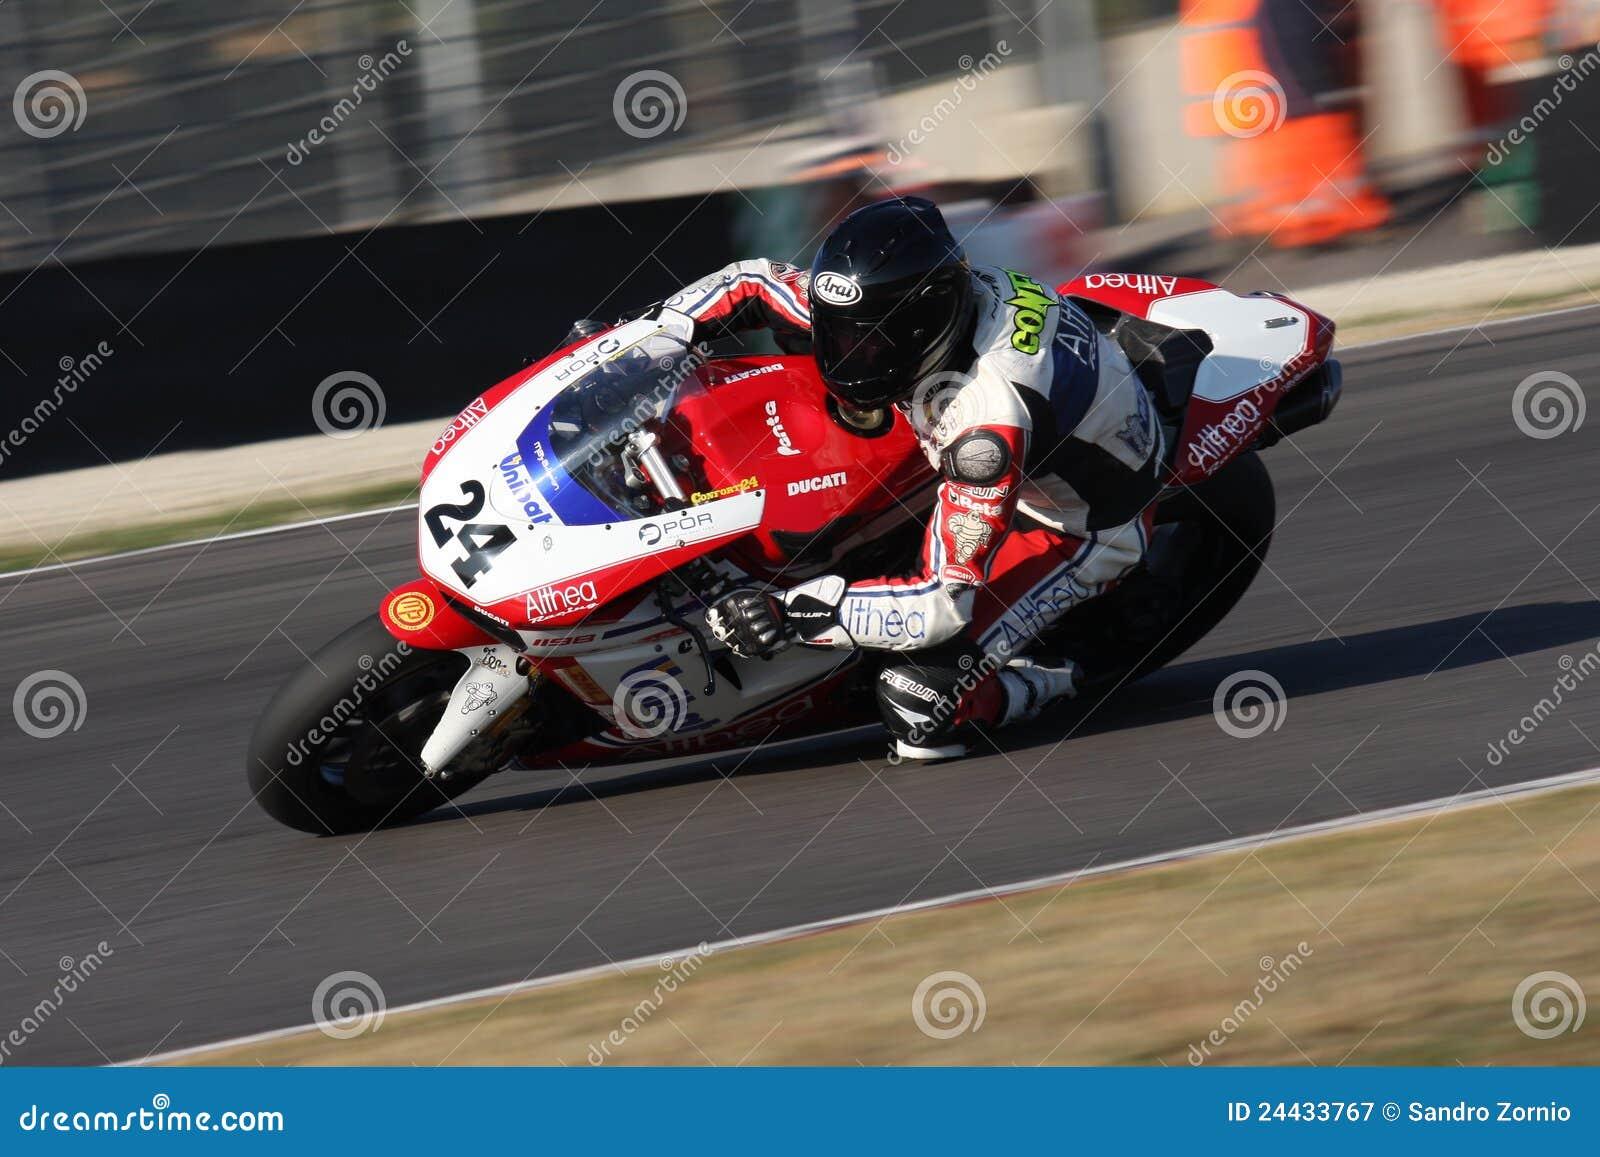 Luca Conforti - Ducati 1198R - Althea Racing